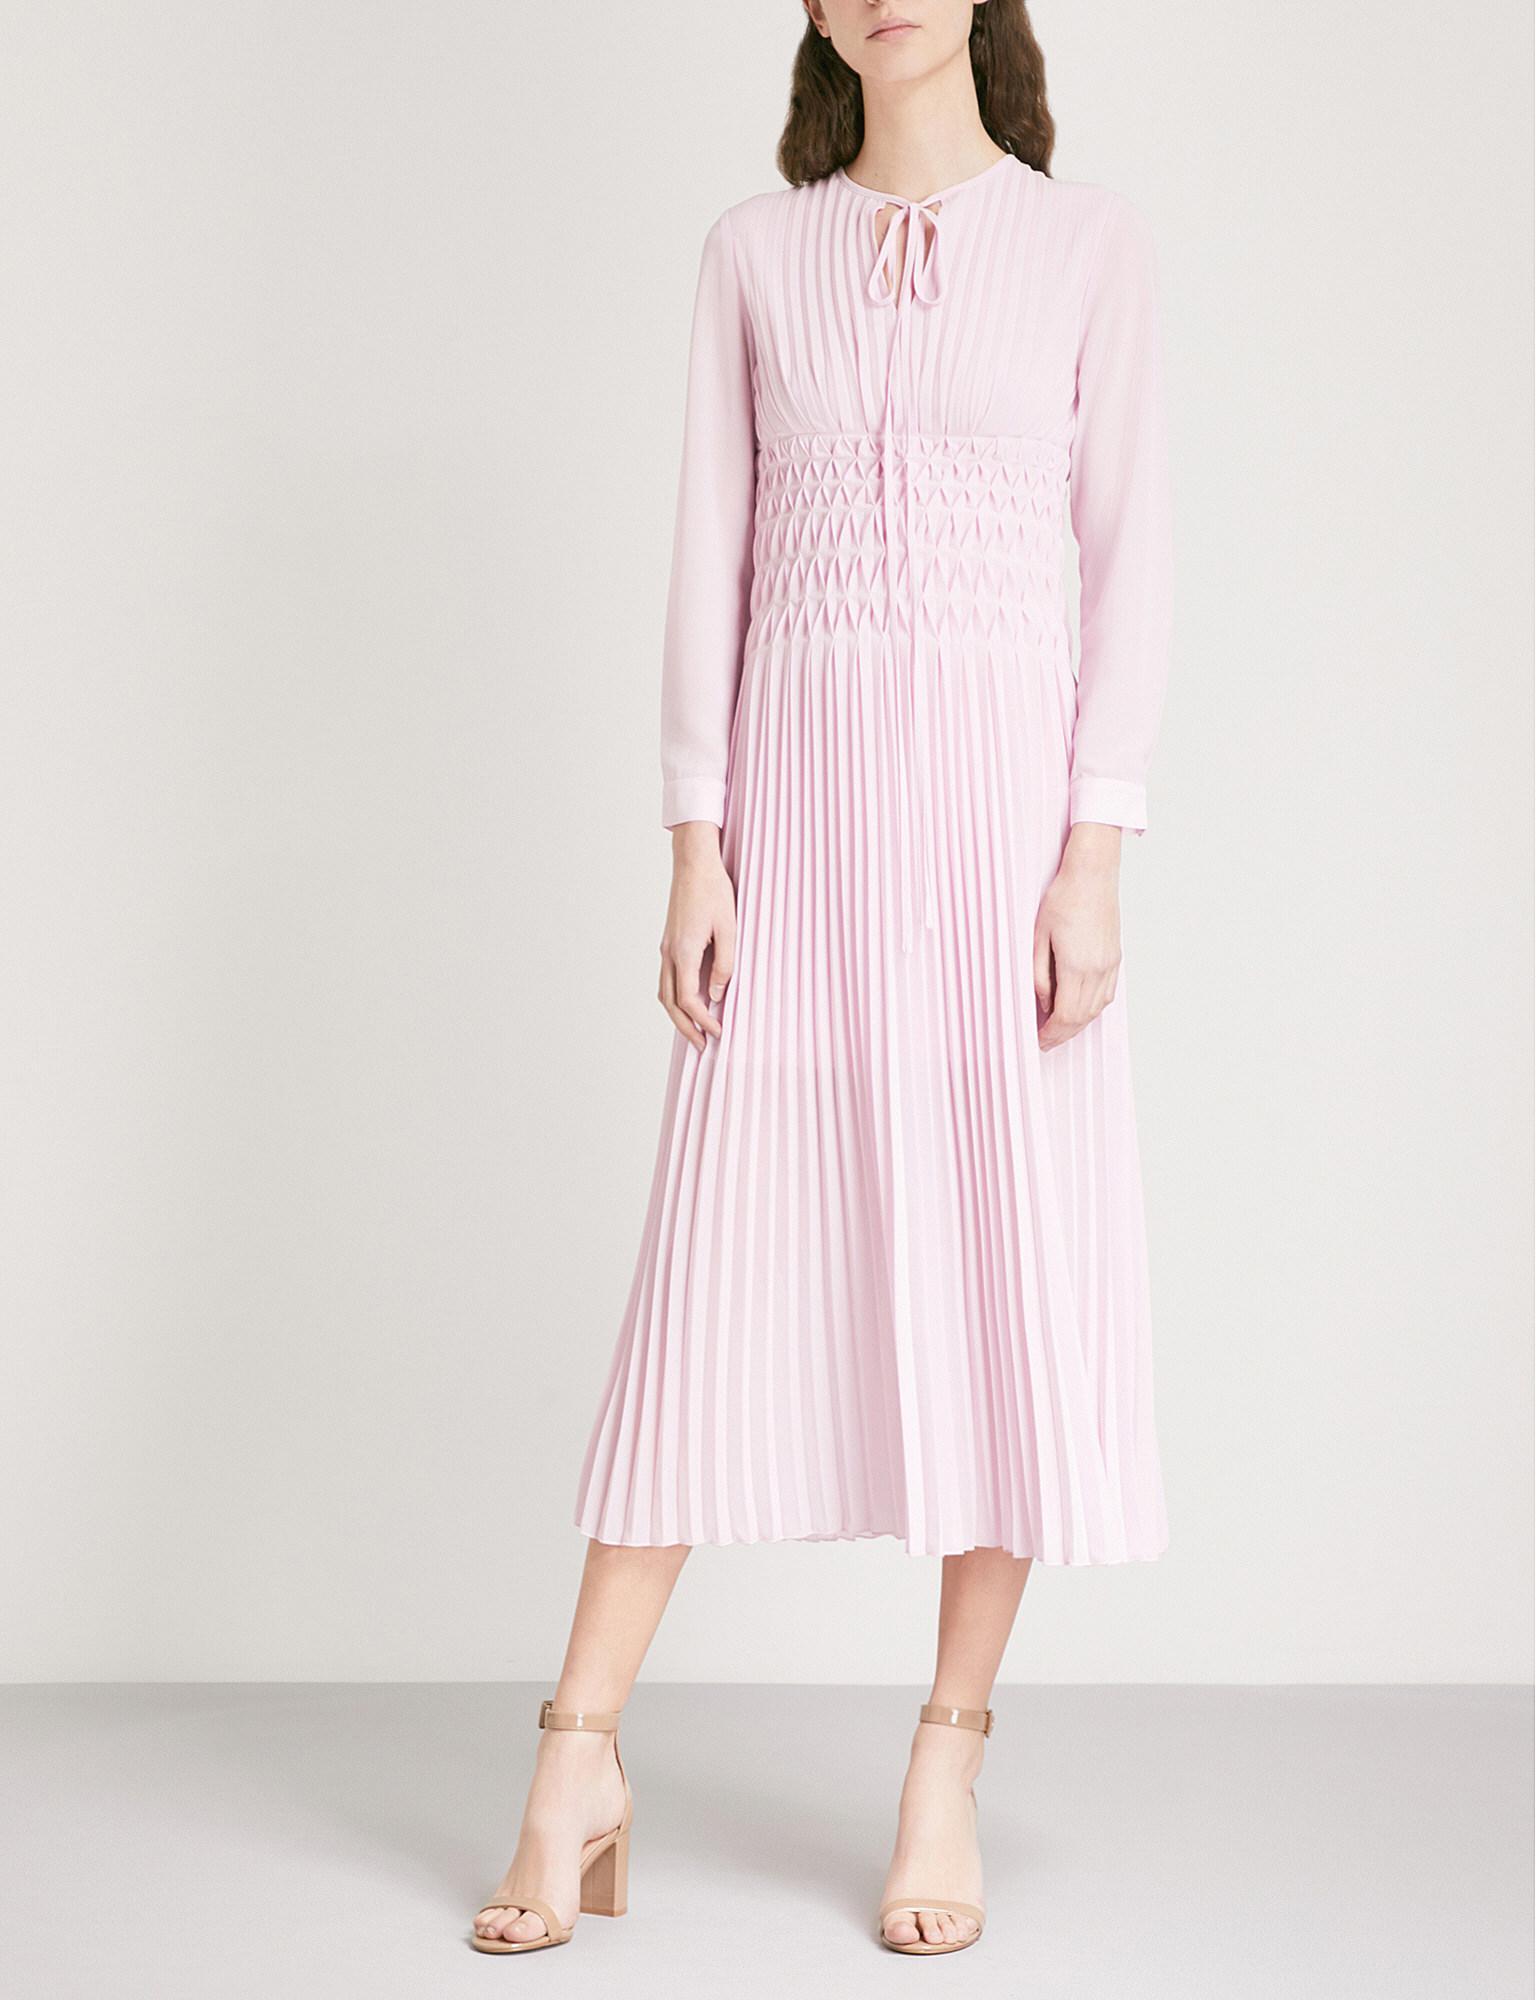 Lilac chiffon midi dress